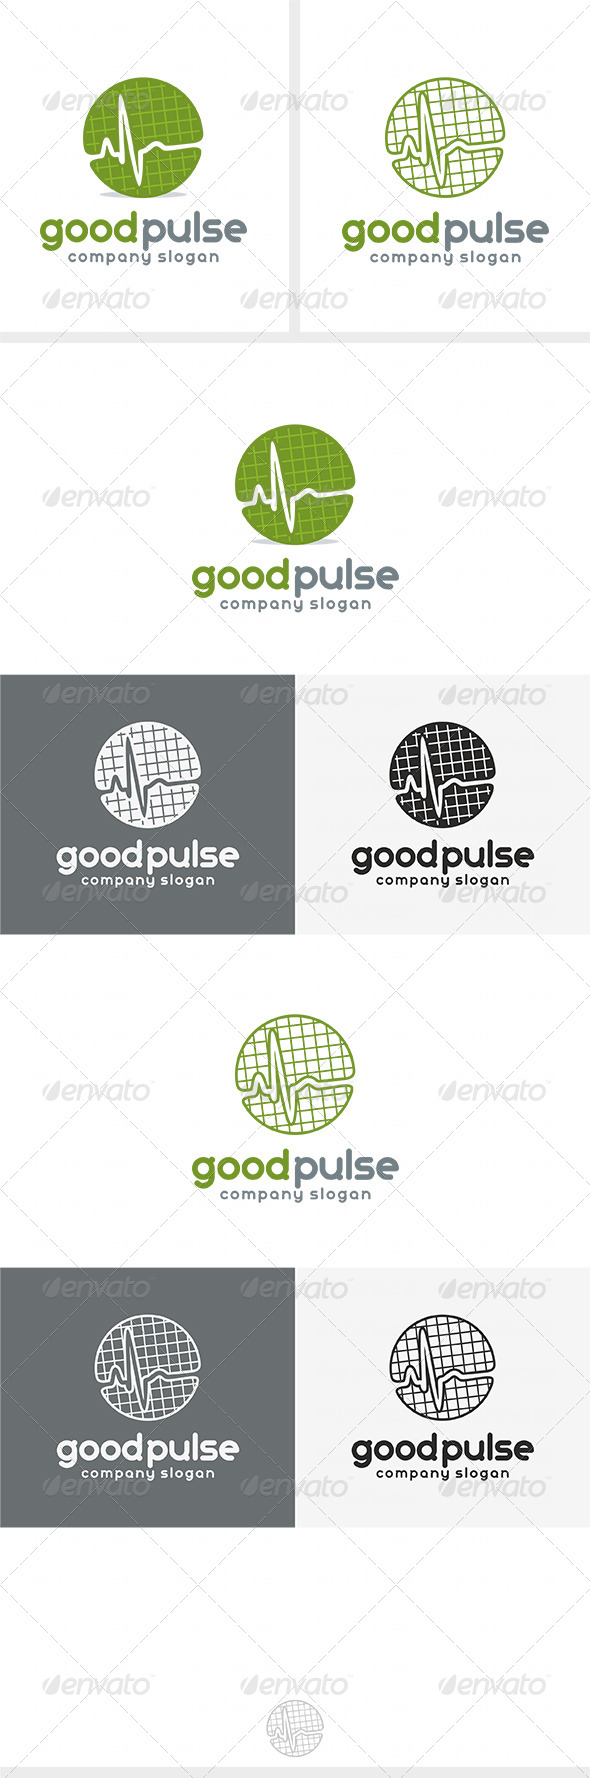 GraphicRiver Good Pulse Logo 4054757